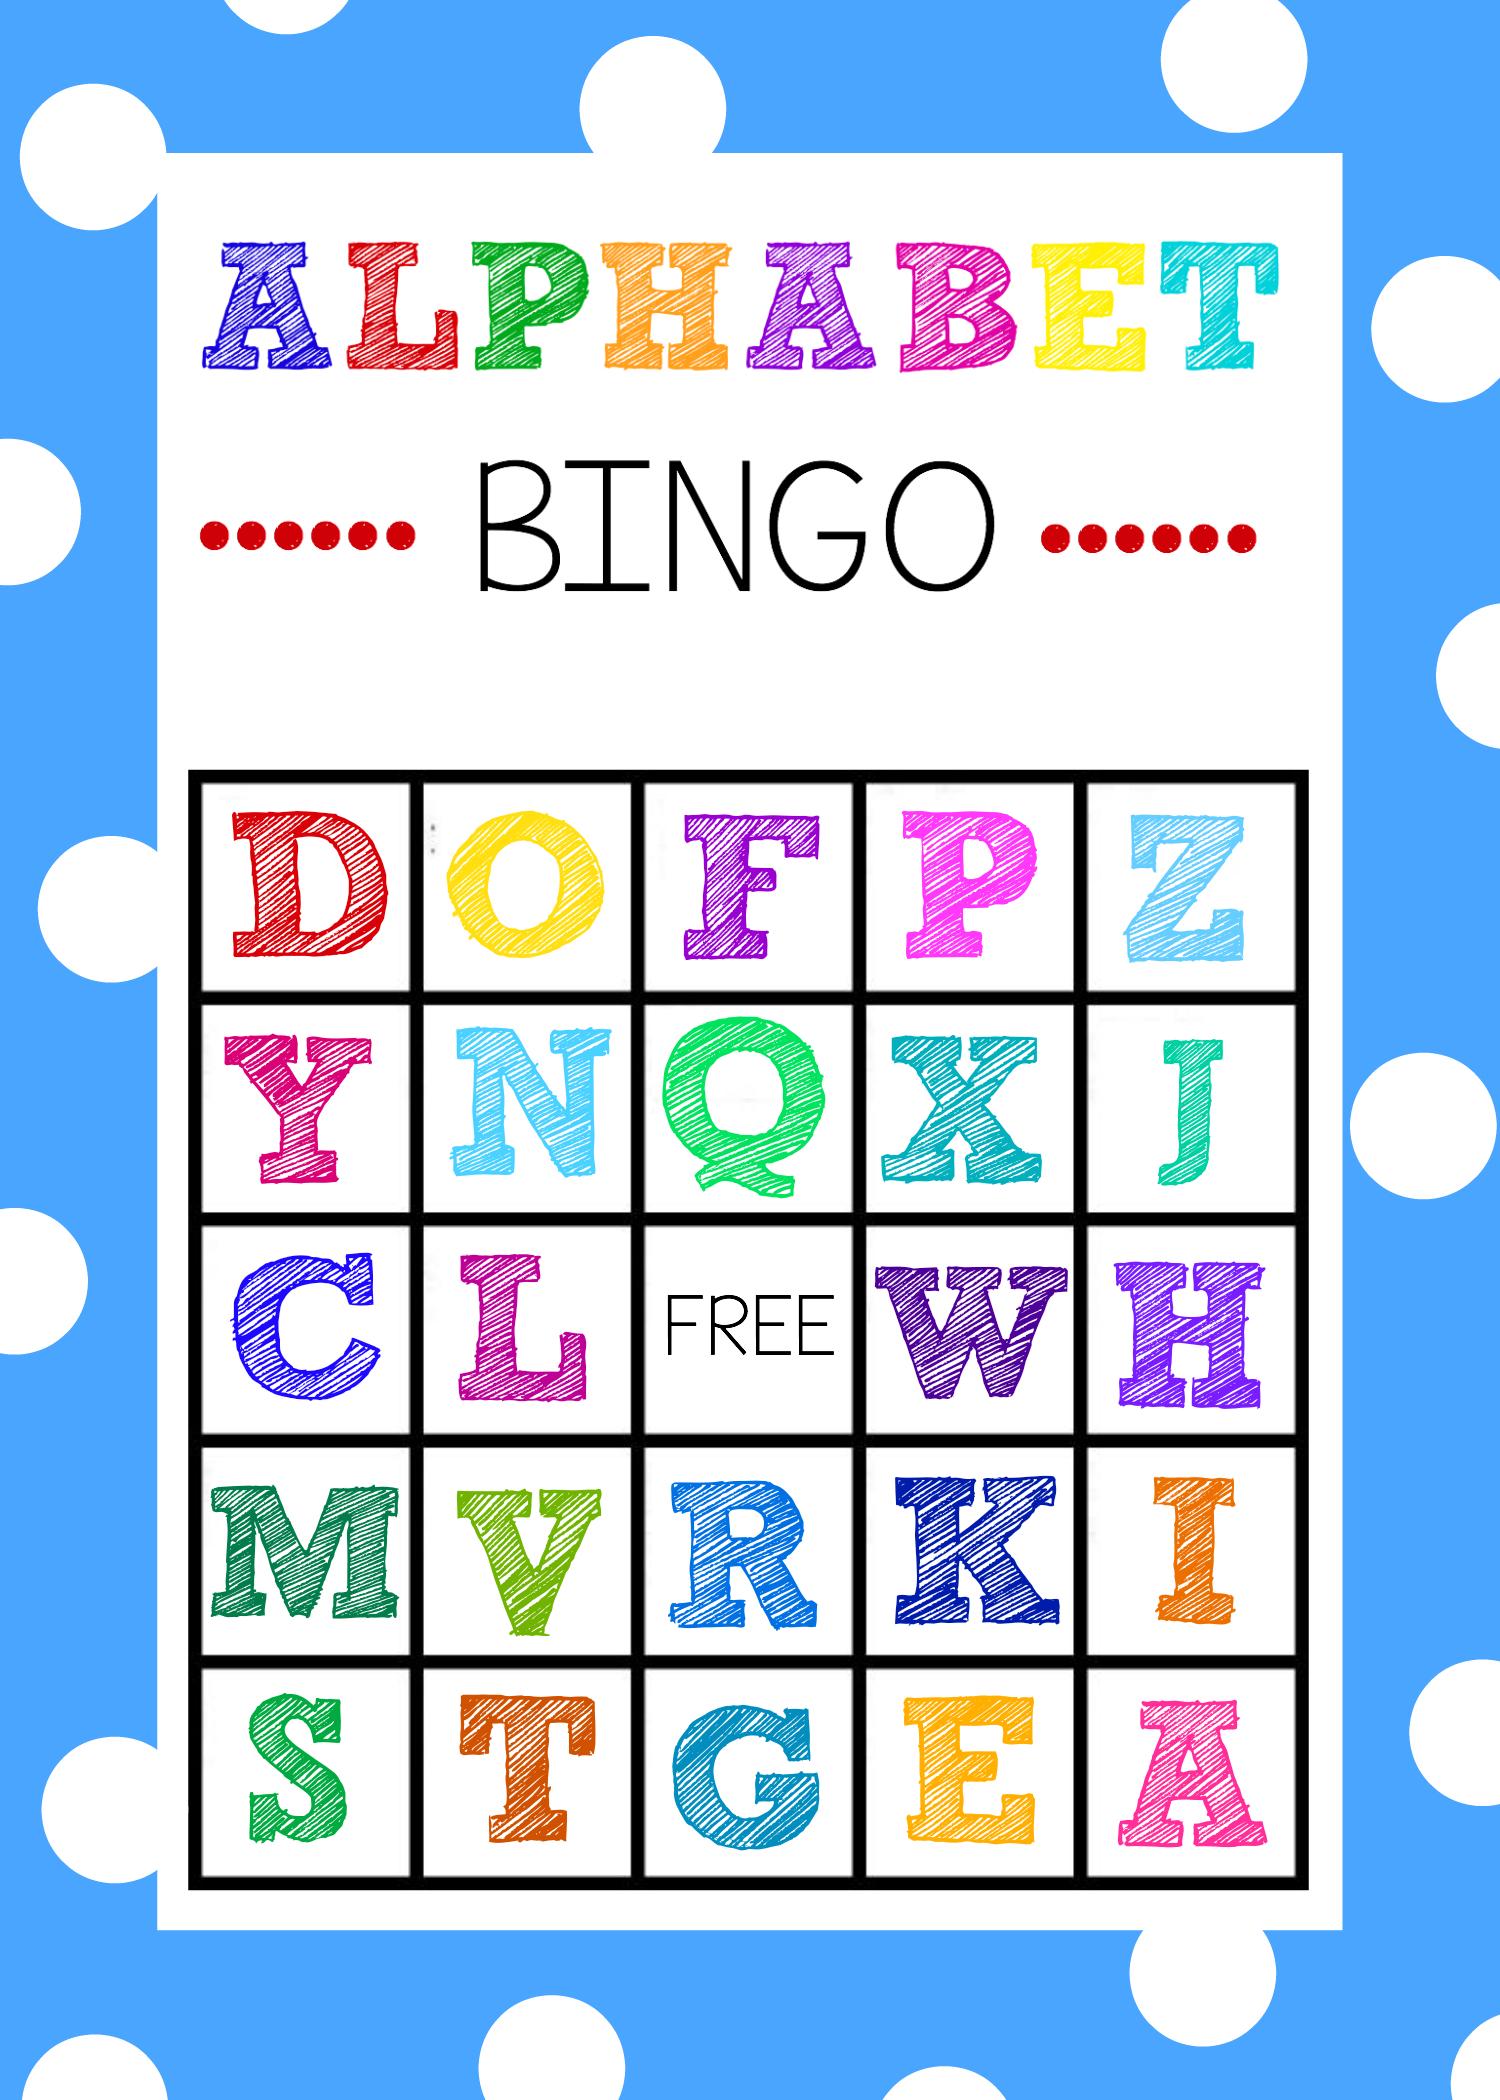 Free Printable Alphabet Bingo Game - Free Printable Alphabet Bingo Cards